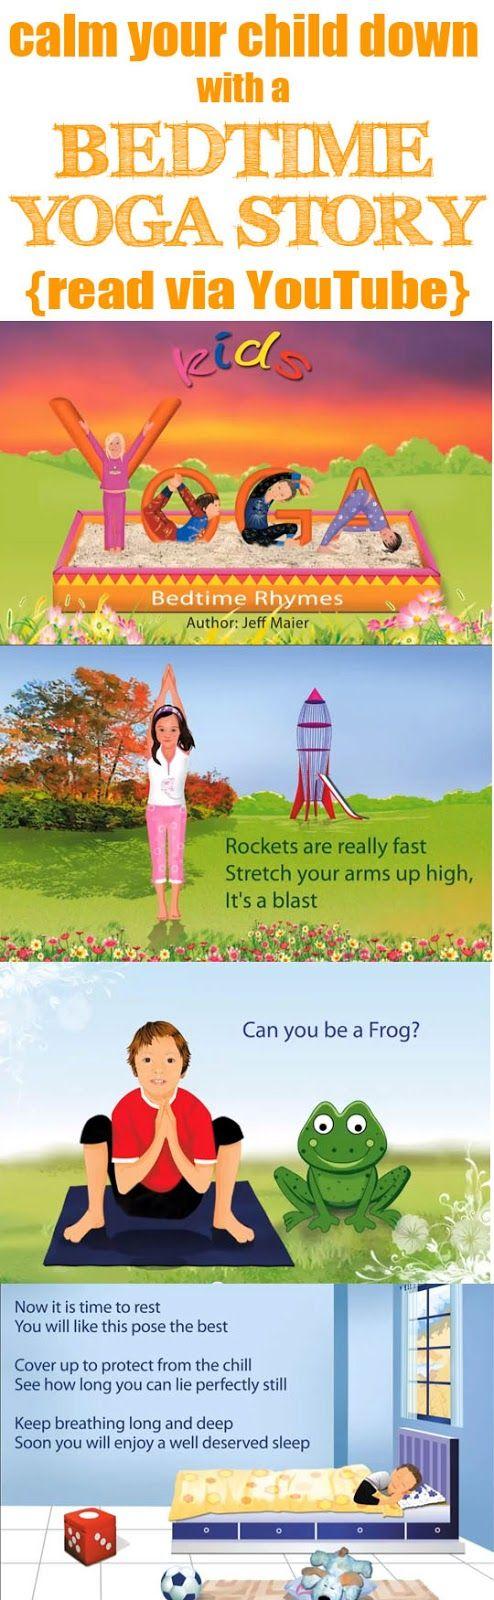 Miss Poppins: Teaching Children Calming Techniques Using Bedtime YOGA Story